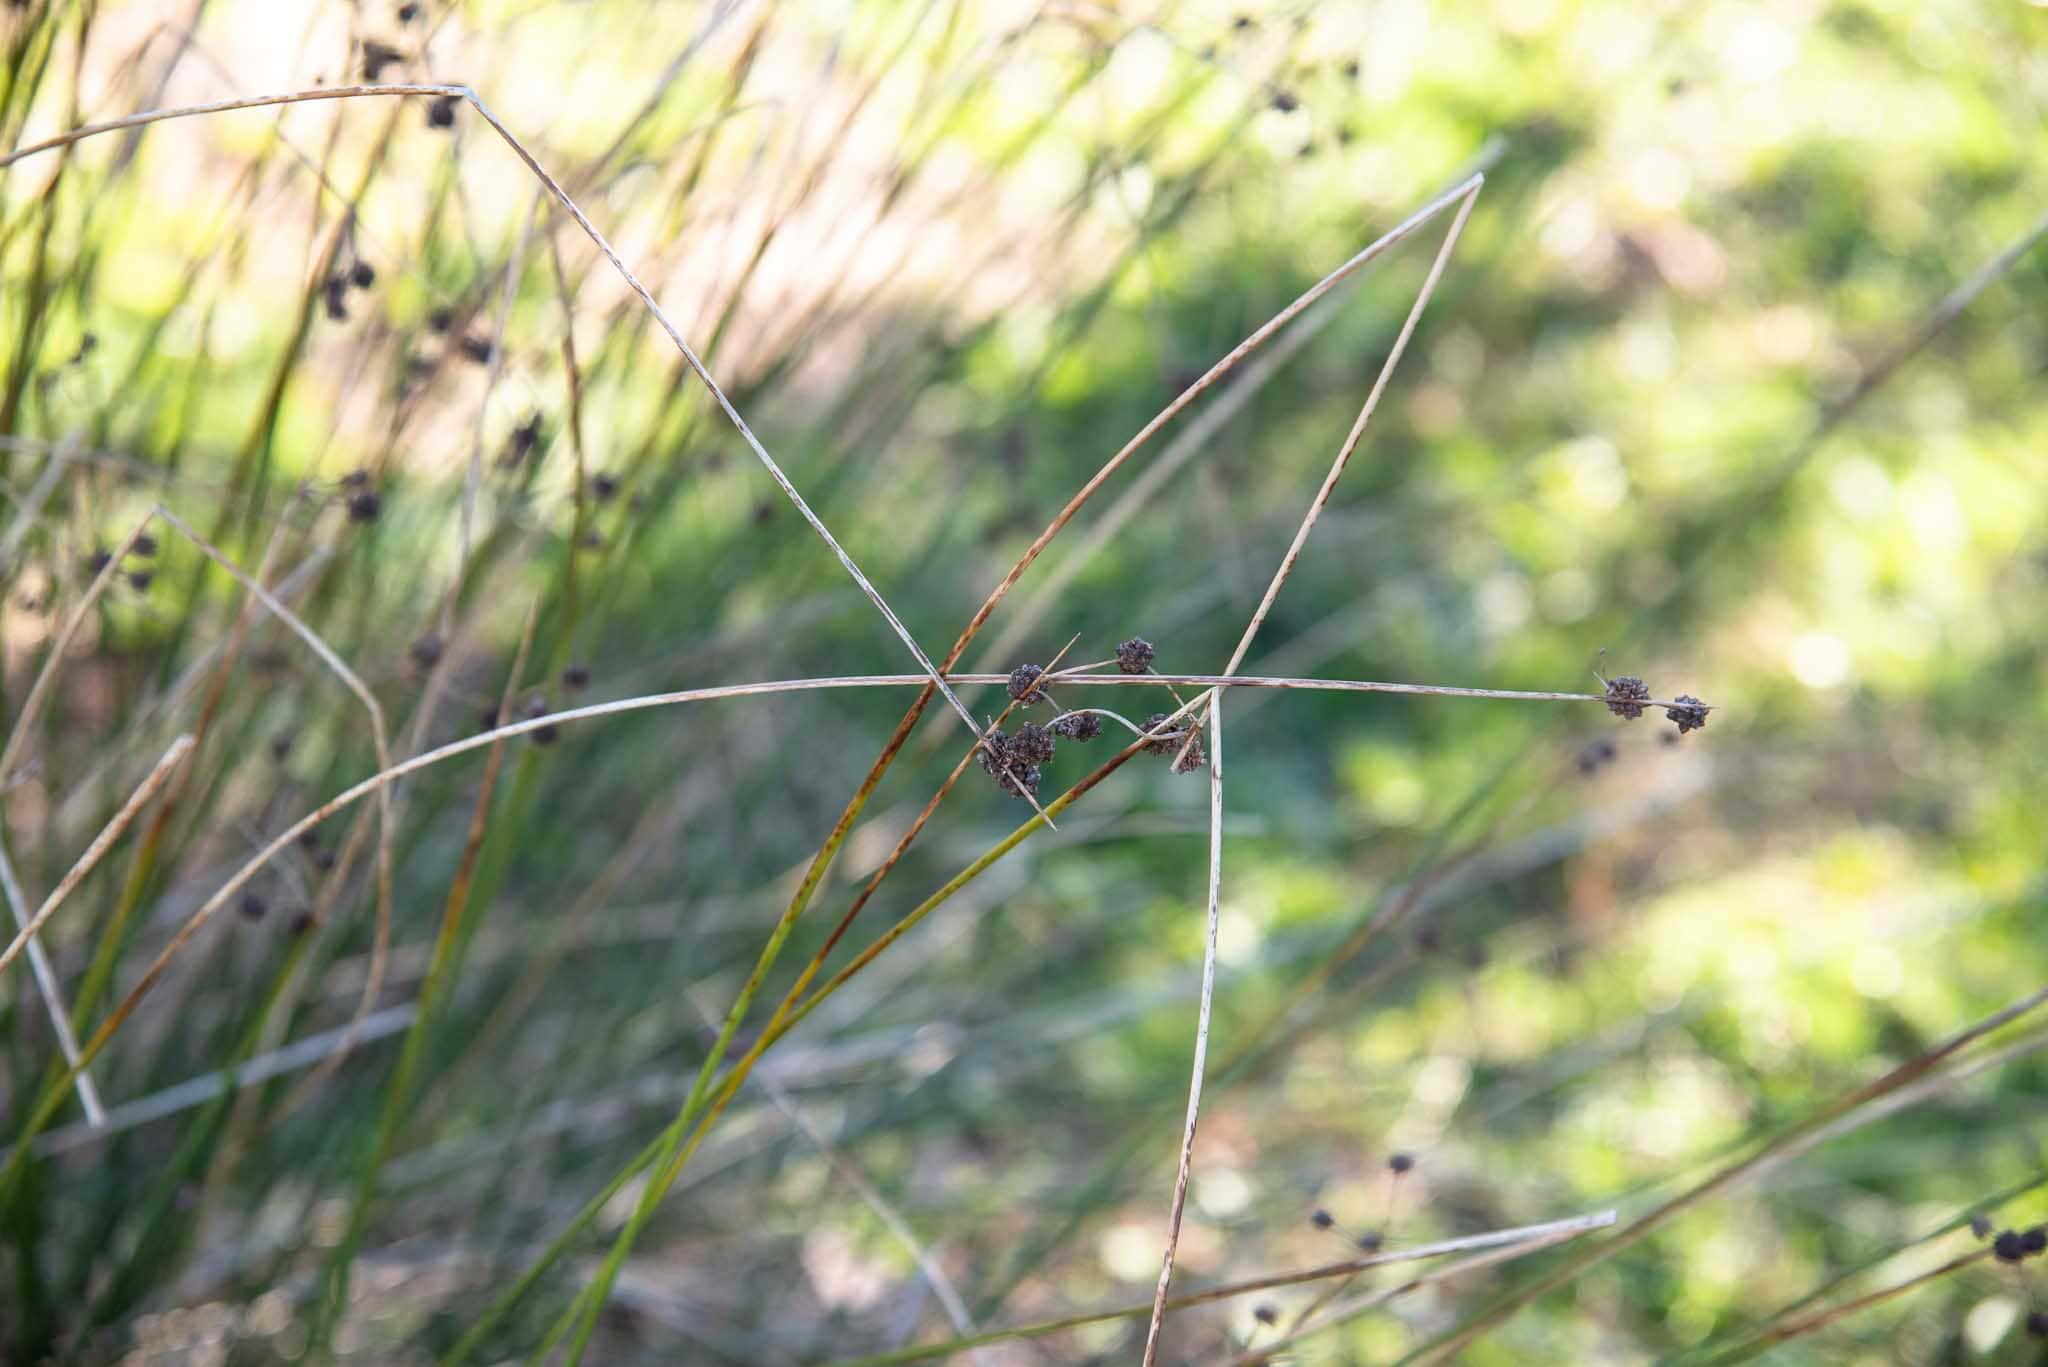 Junco churrero (Scirpus holoschoenus) en Palillos